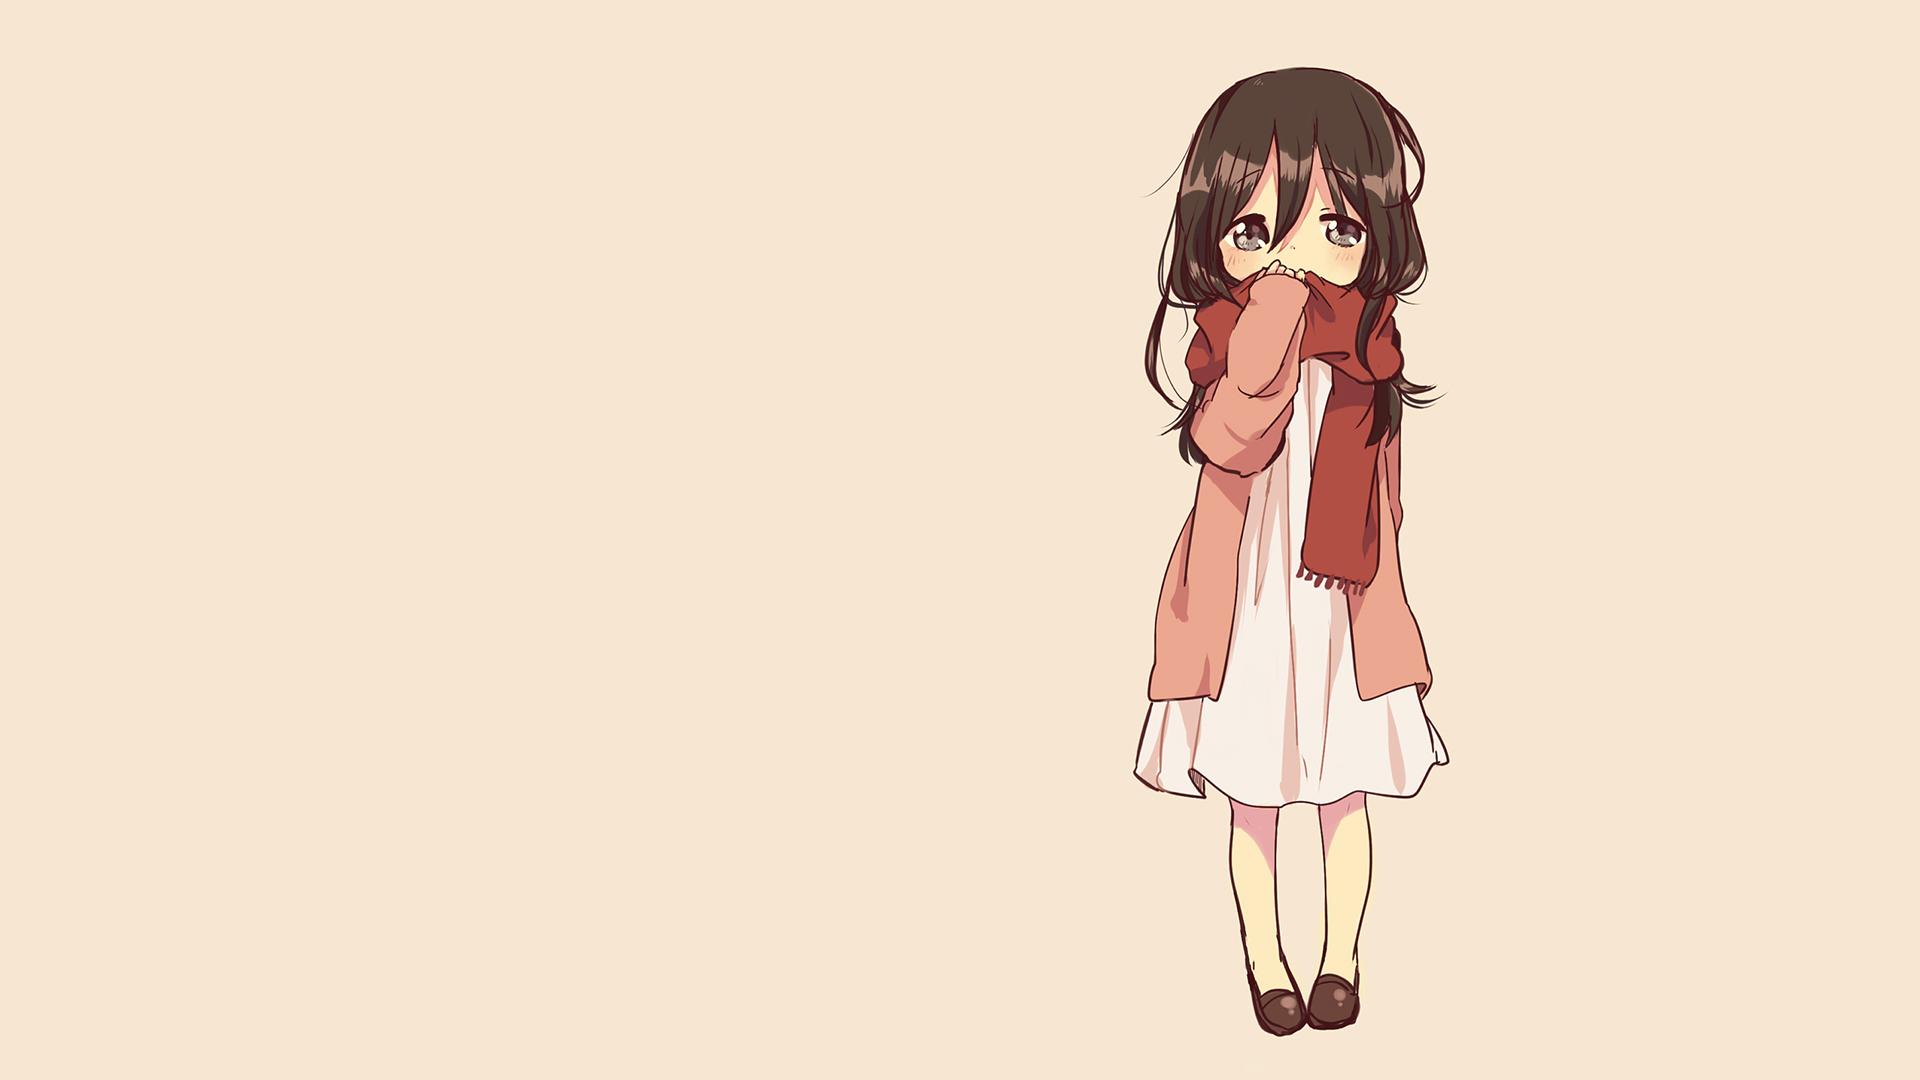 Wallpaper Drawing Illustration Anime Girls Cartoon Shingeki No Kyojin Mikasa Ackerman Hand Sketch Mangaka 1920x1080 Artarek 263144 Hd Wallpapers Wallhere